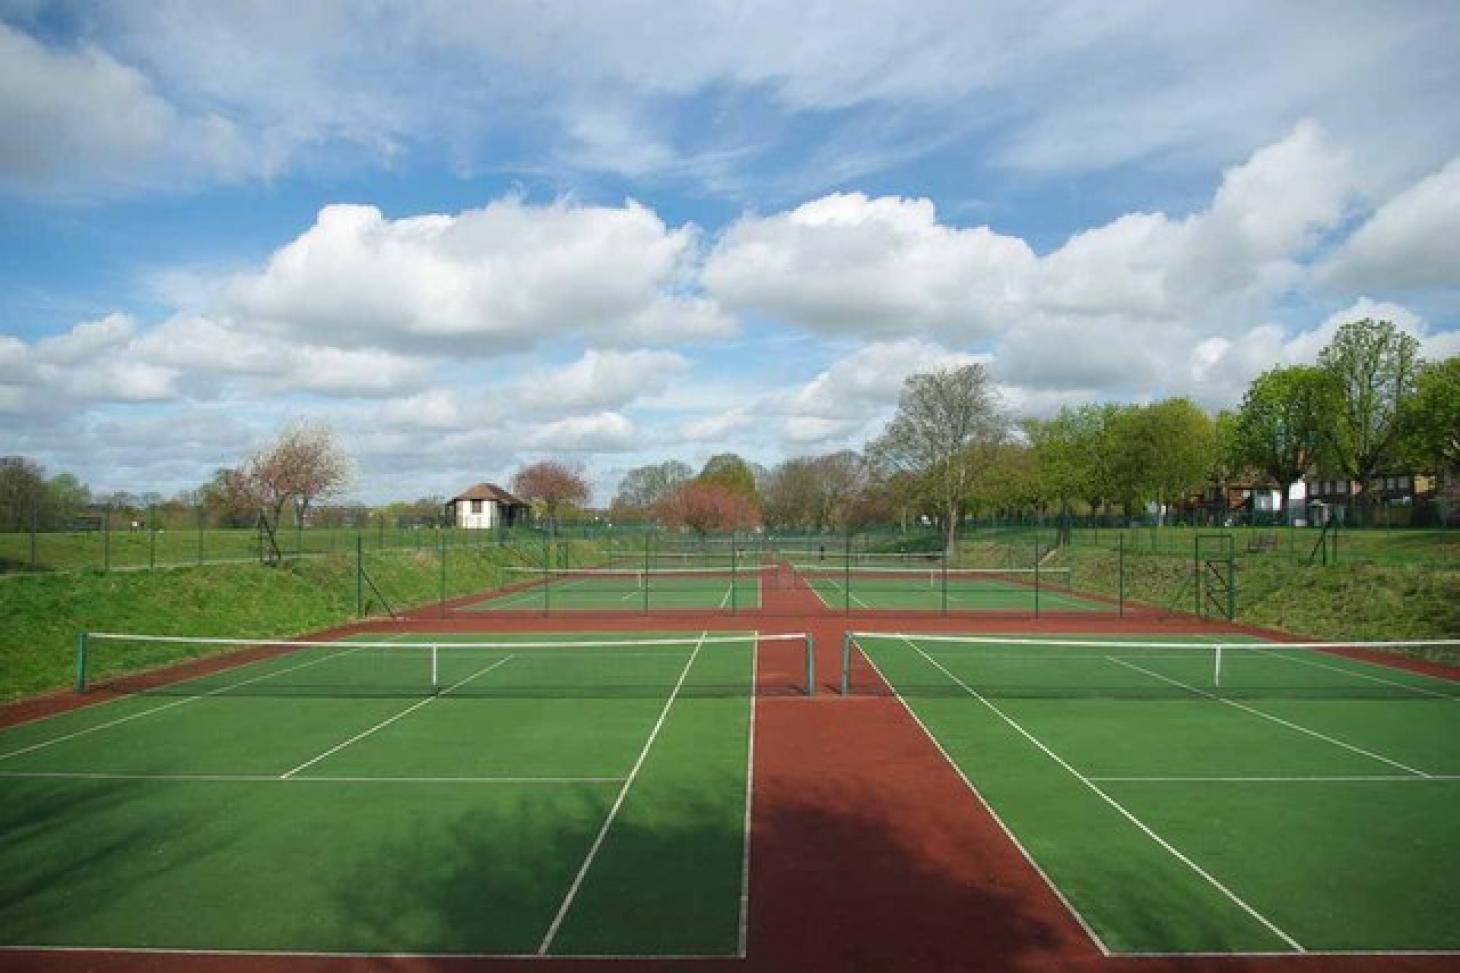 Raphael Park Tennis Courts Outdoor | Hard (macadam) tennis court